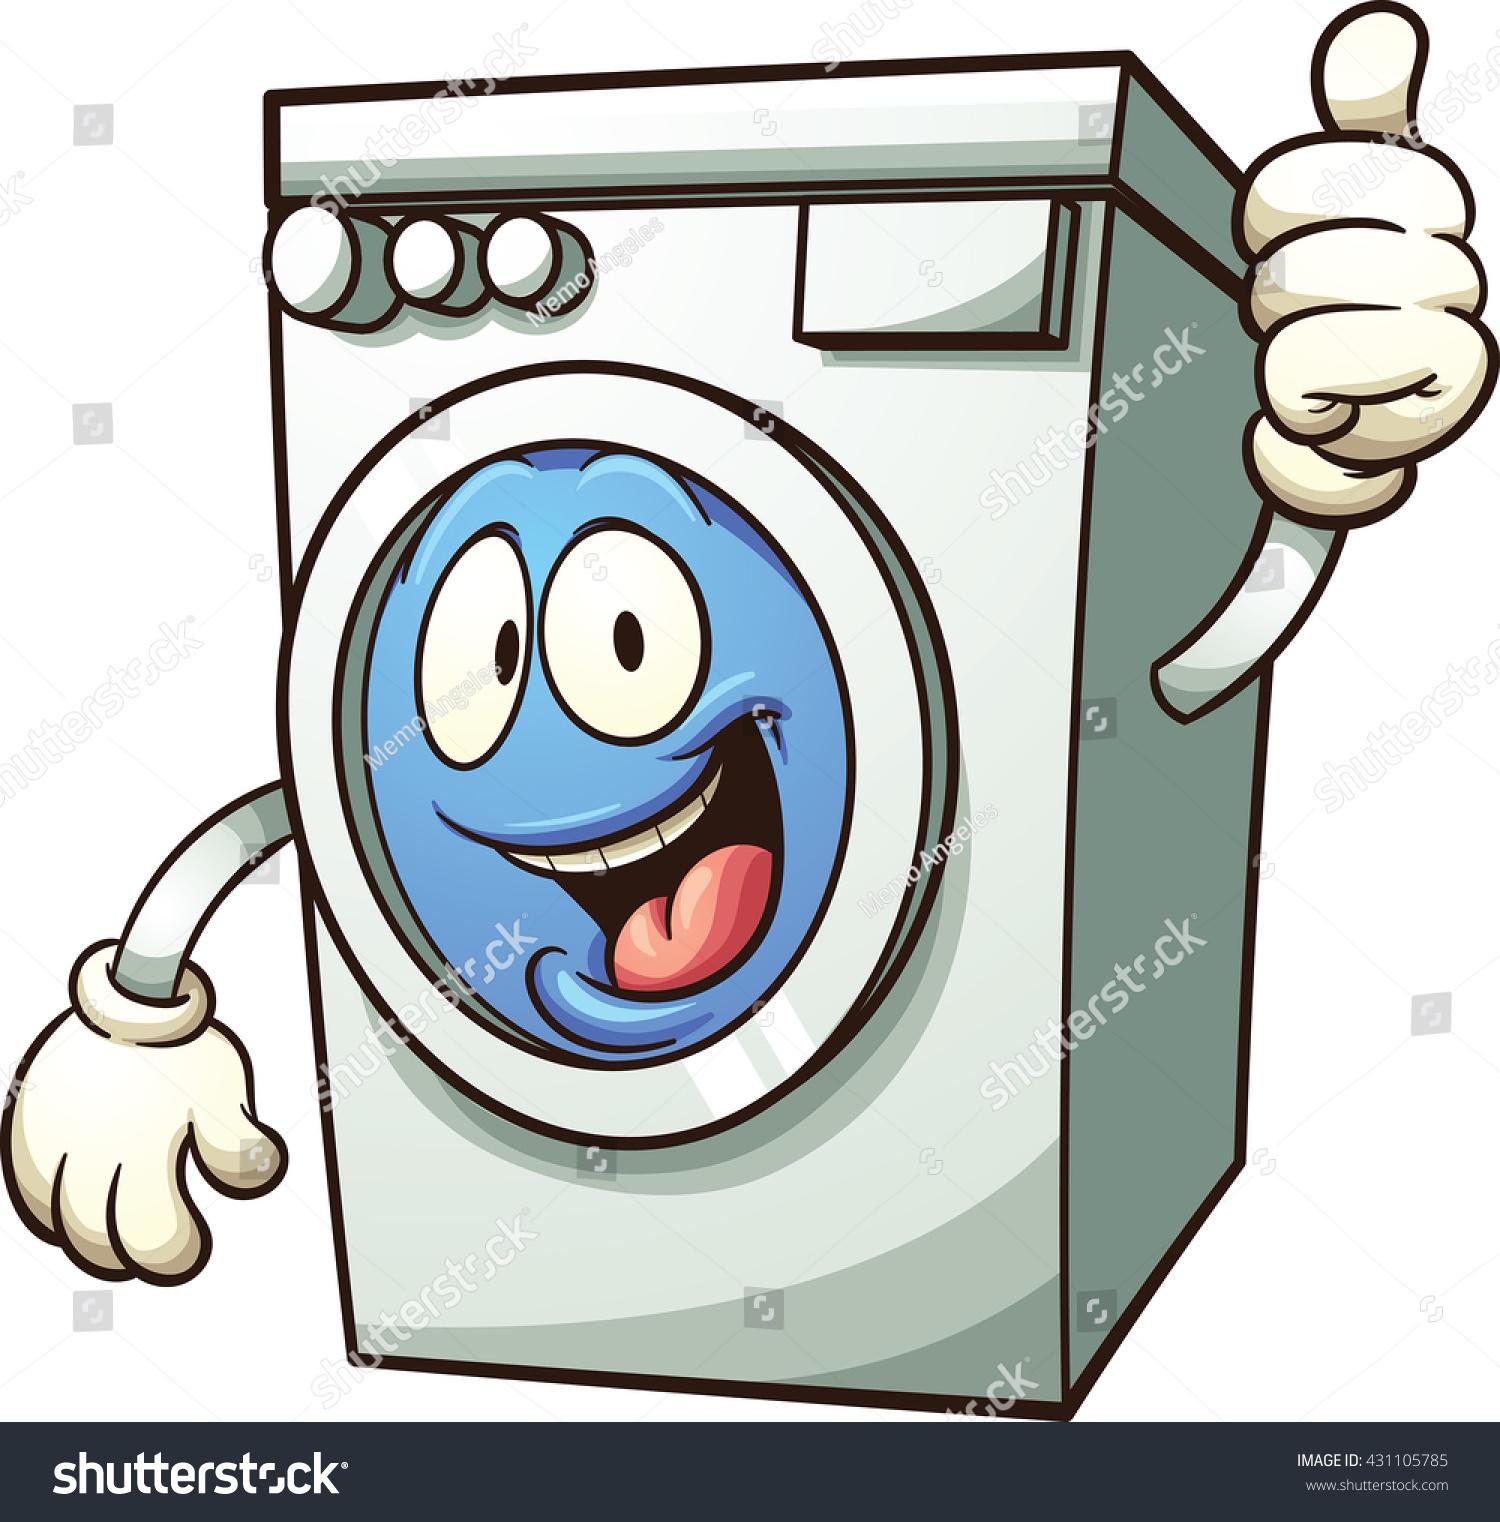 laundry machine clip